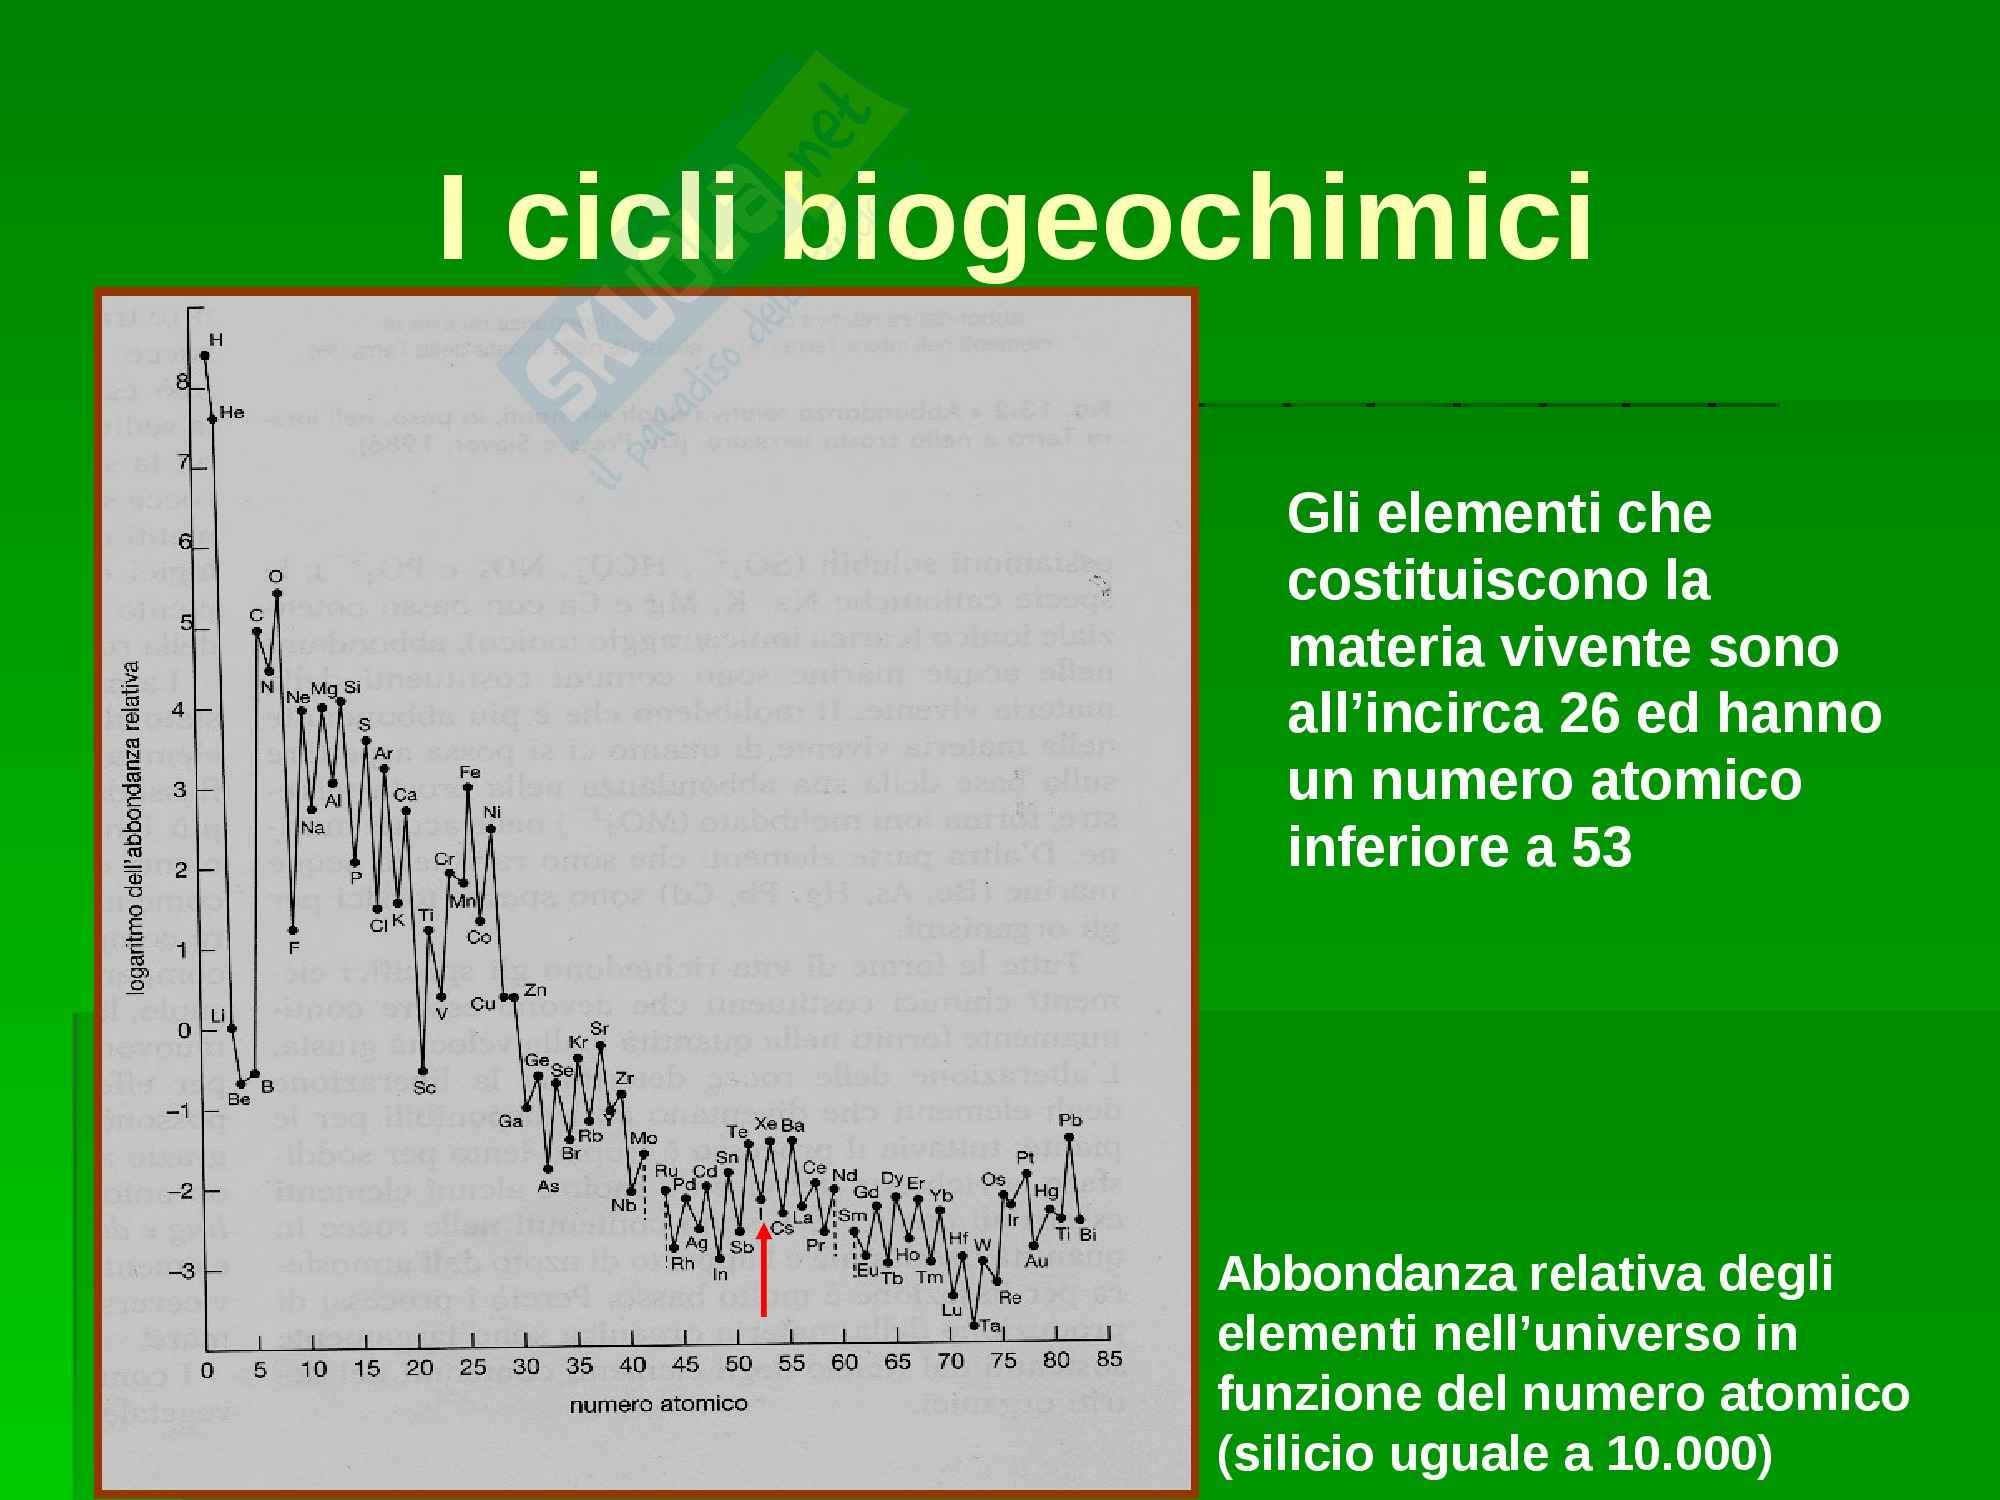 Ecologia - cicli biogeochimici